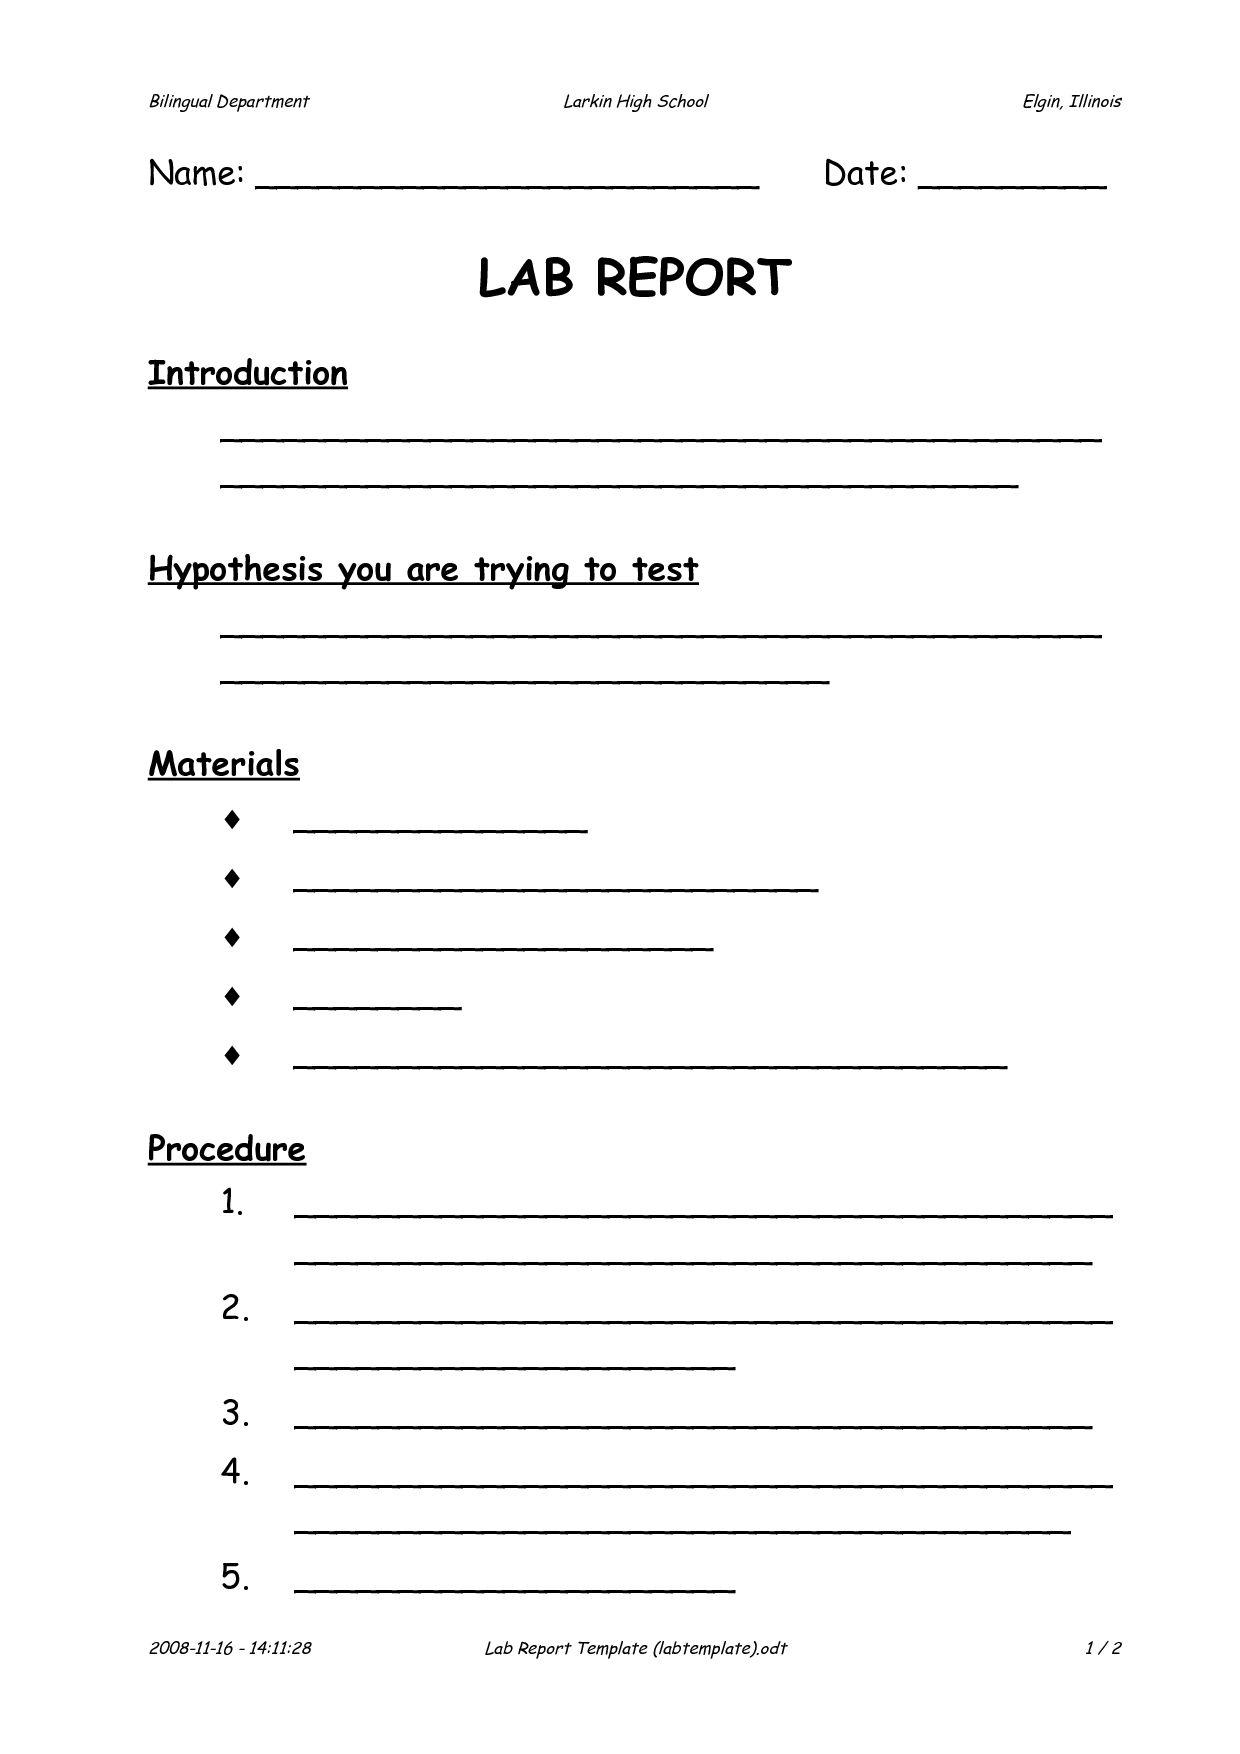 Lab Report Template Nvh 7glt4bds Nel